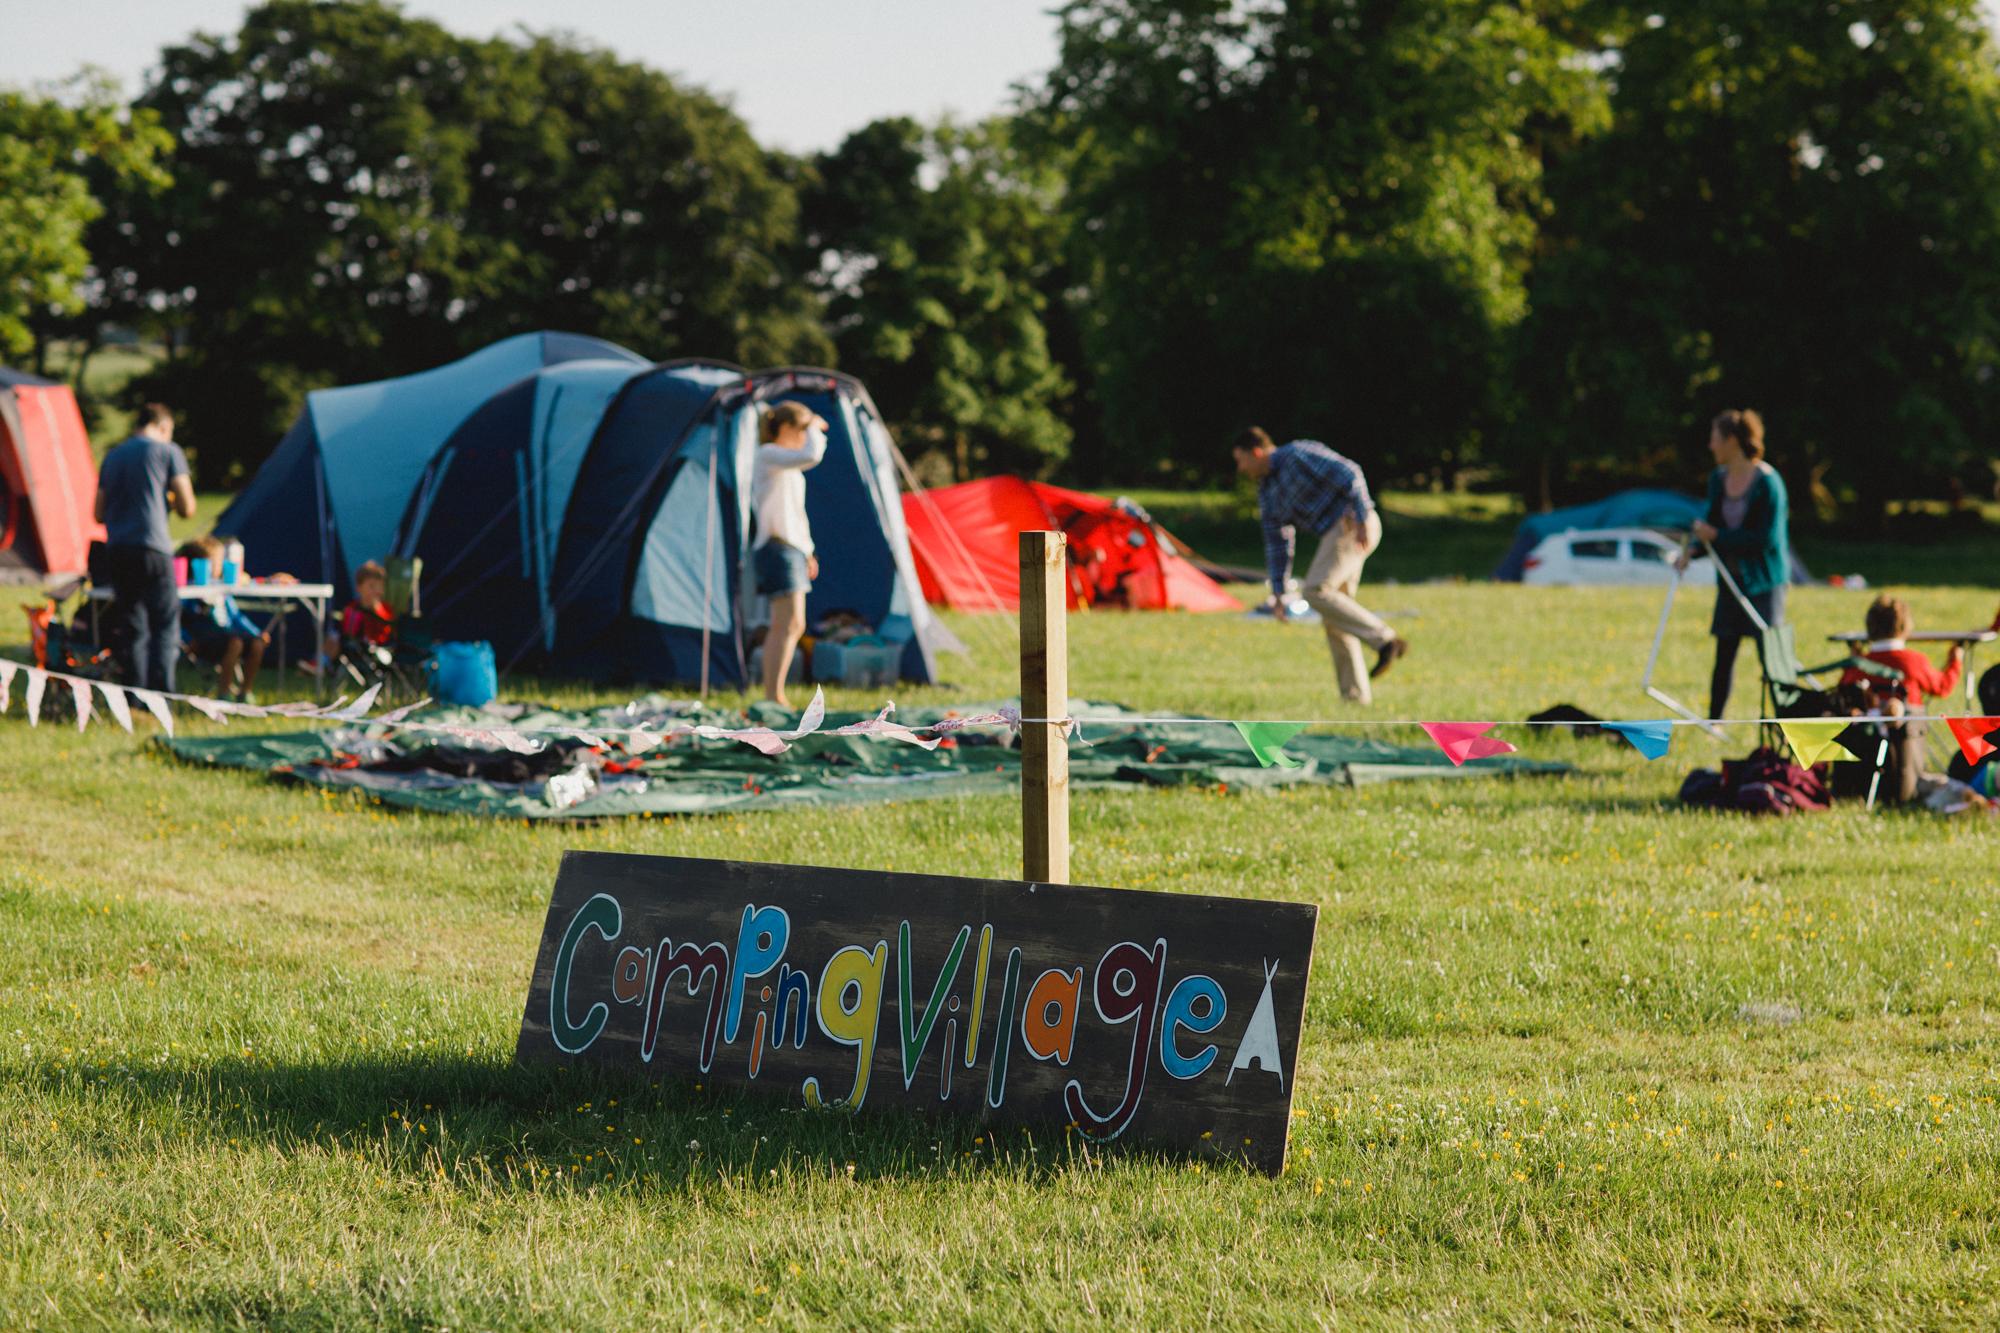 WH Camping Village.jpg